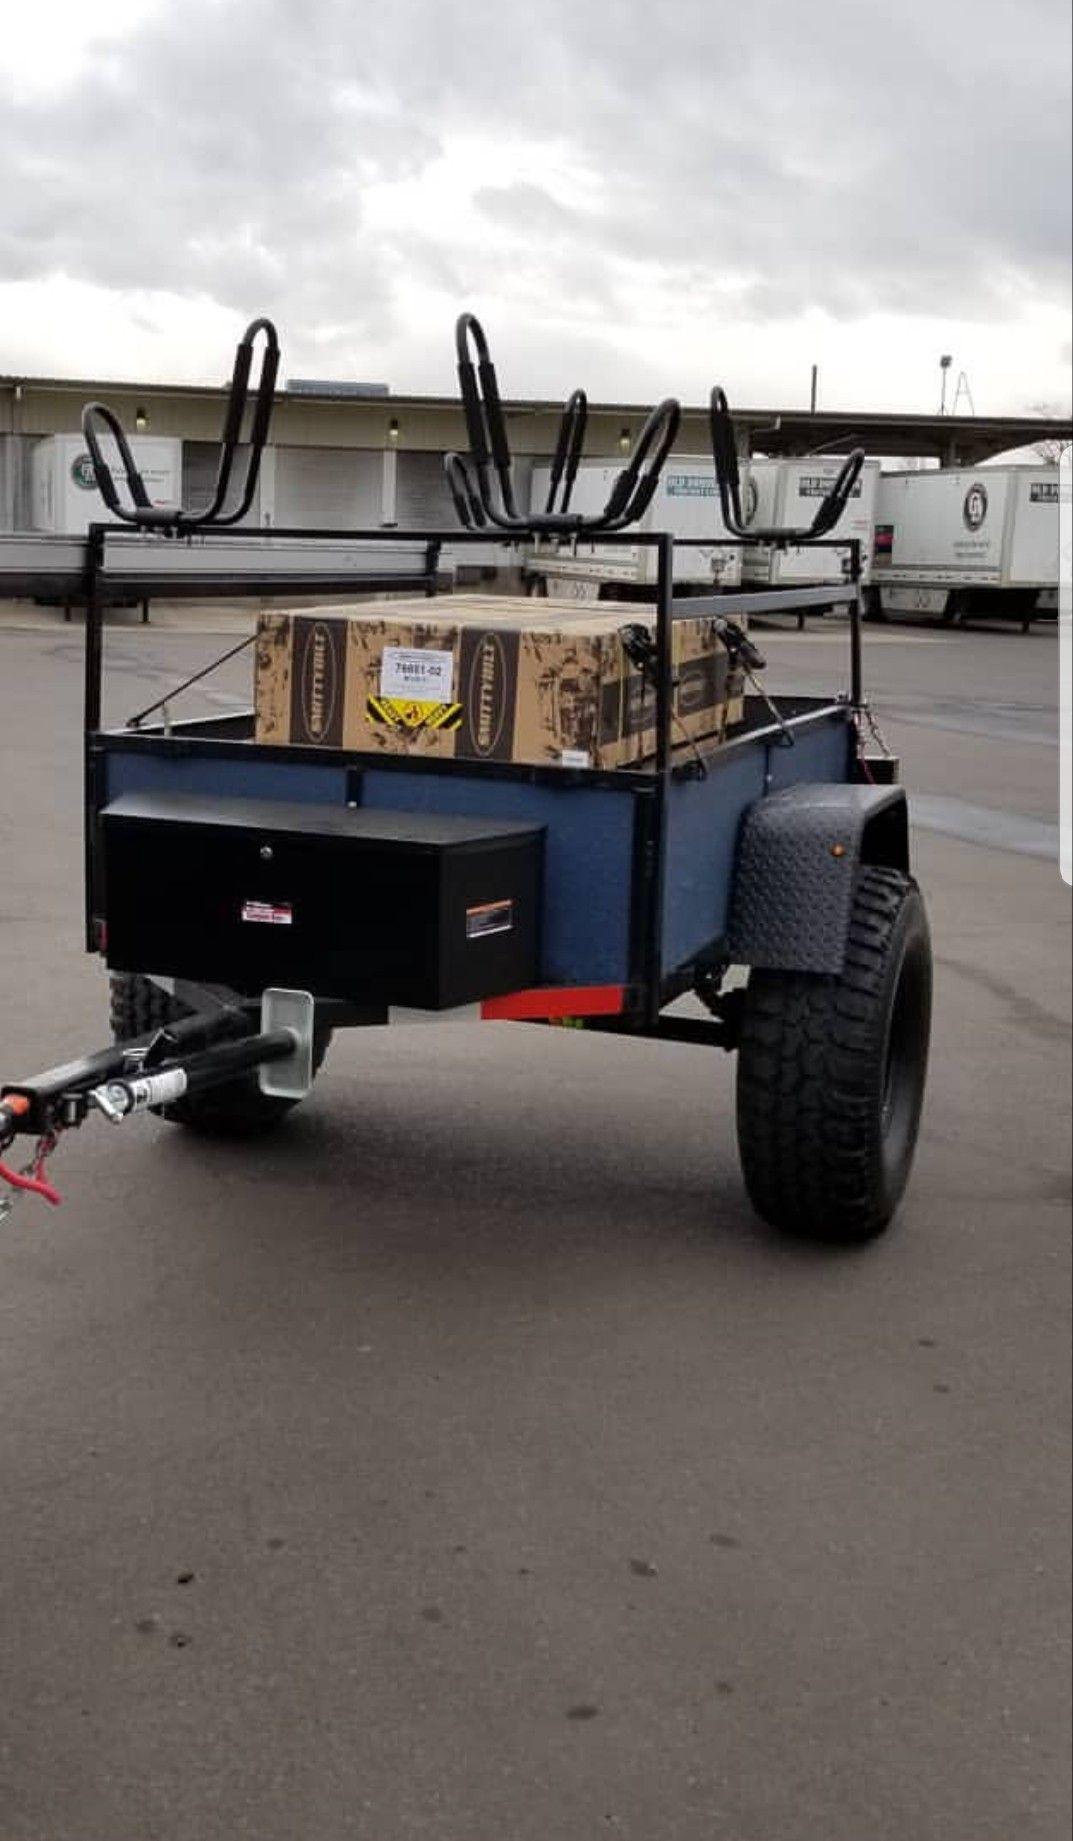 Diy 4x4 offroad trailer off road trailer off road